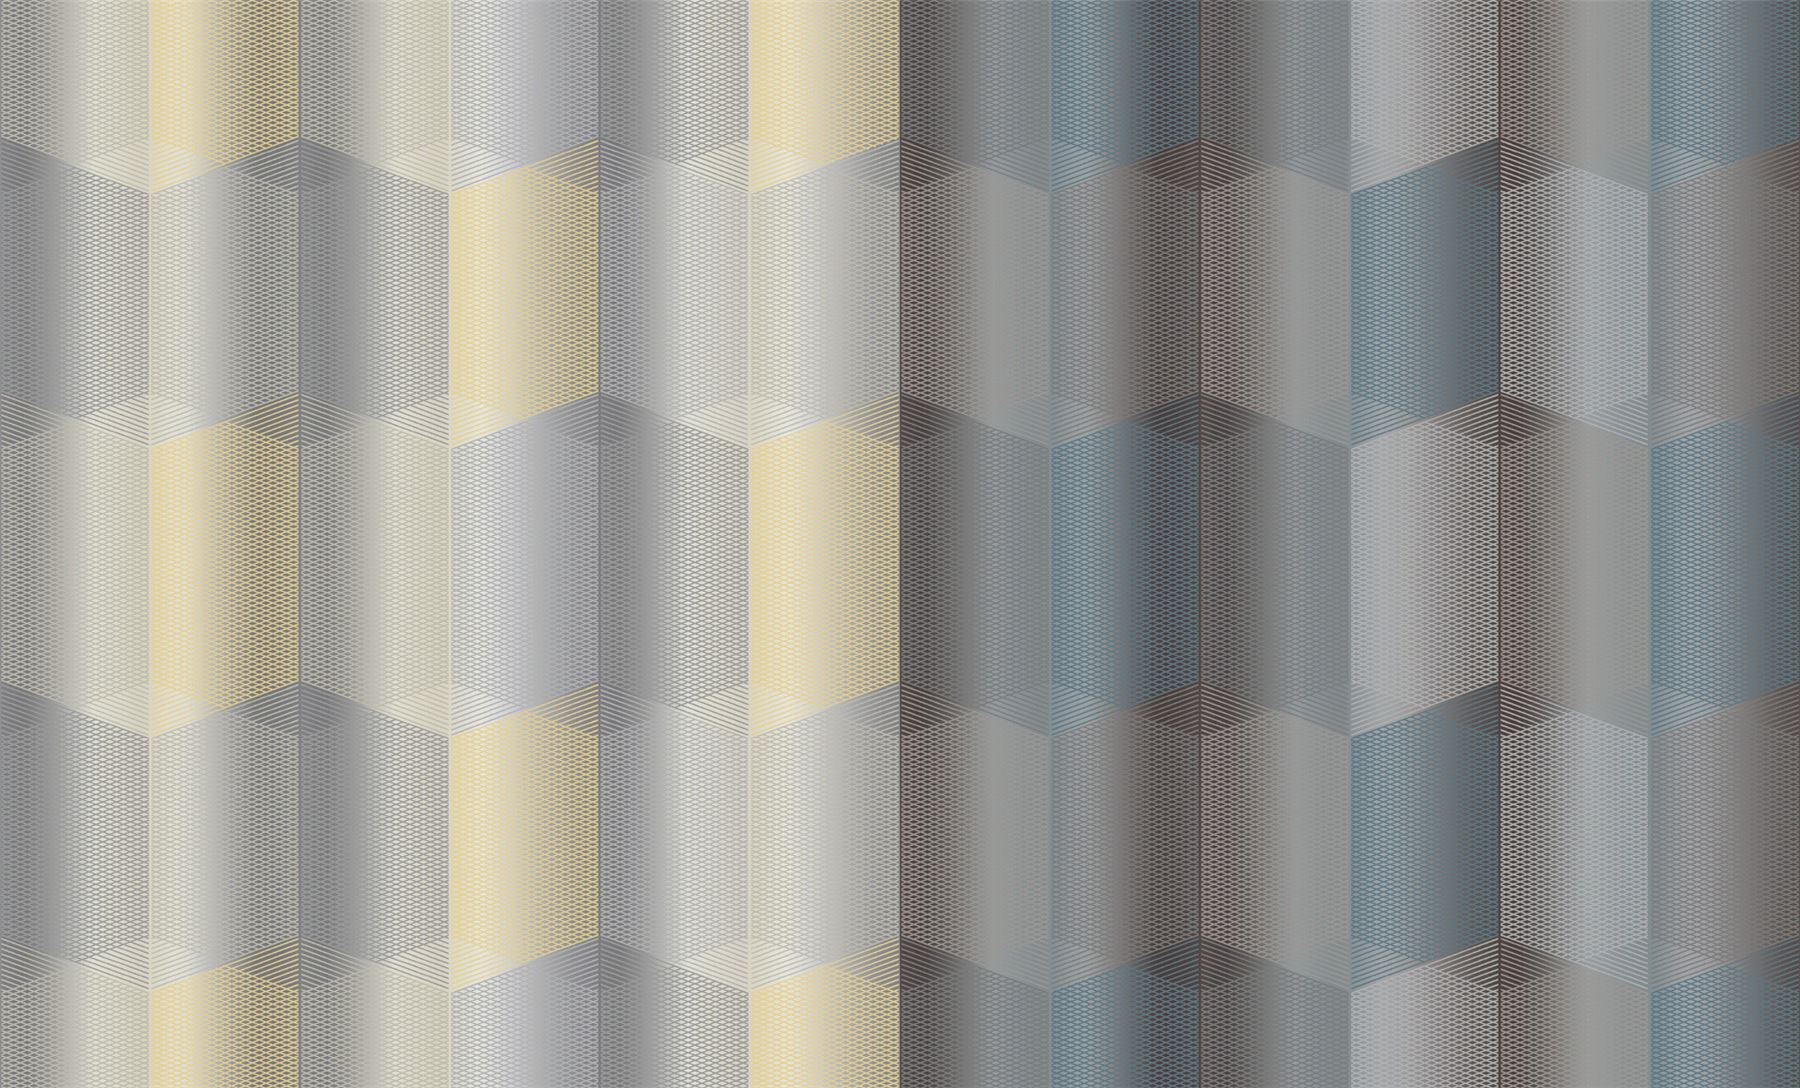 3 X Teal Grey Geometric 3d Hexagon Wallpaper Textured Metallic Grandeco Radial